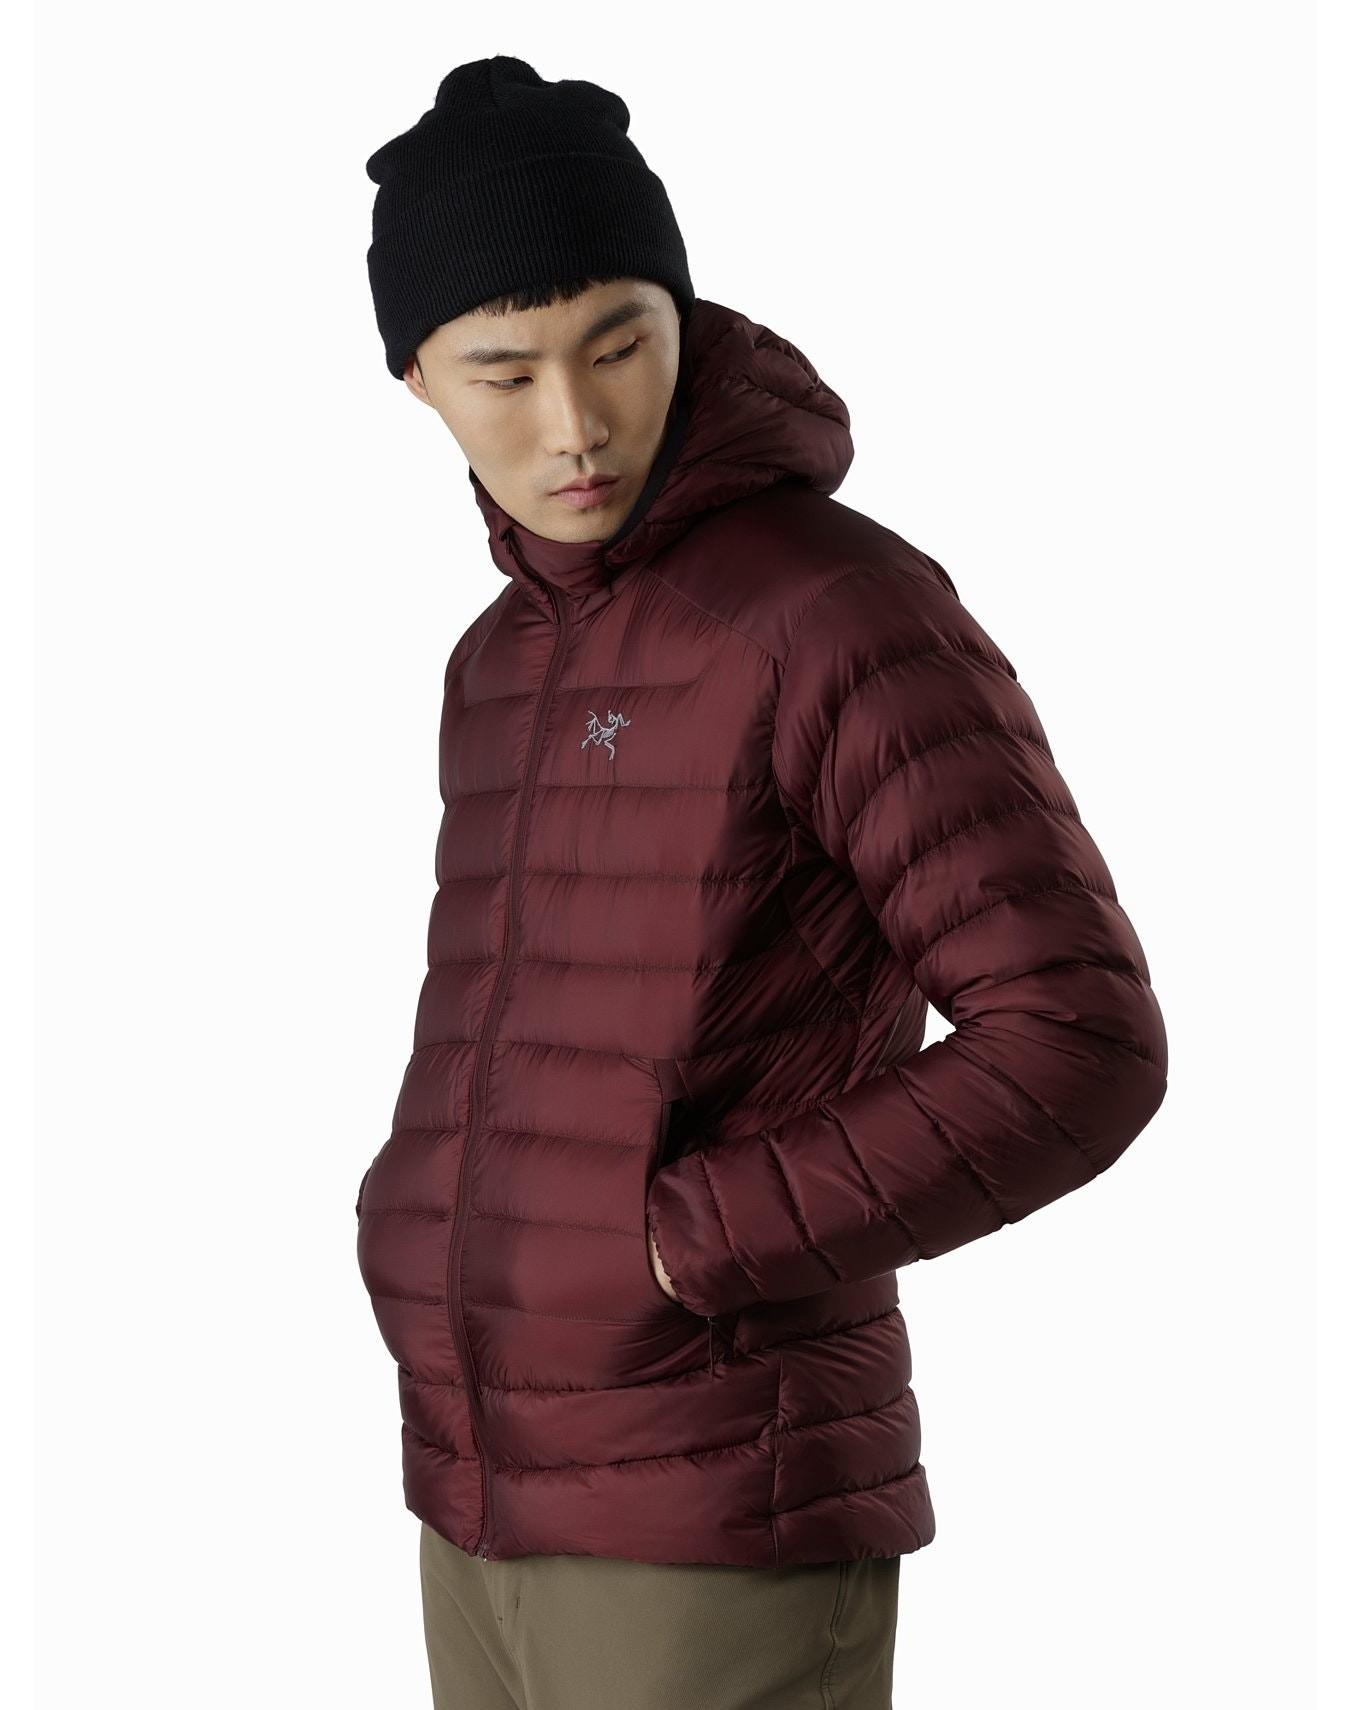 man wearing a puffer jacket from llbean